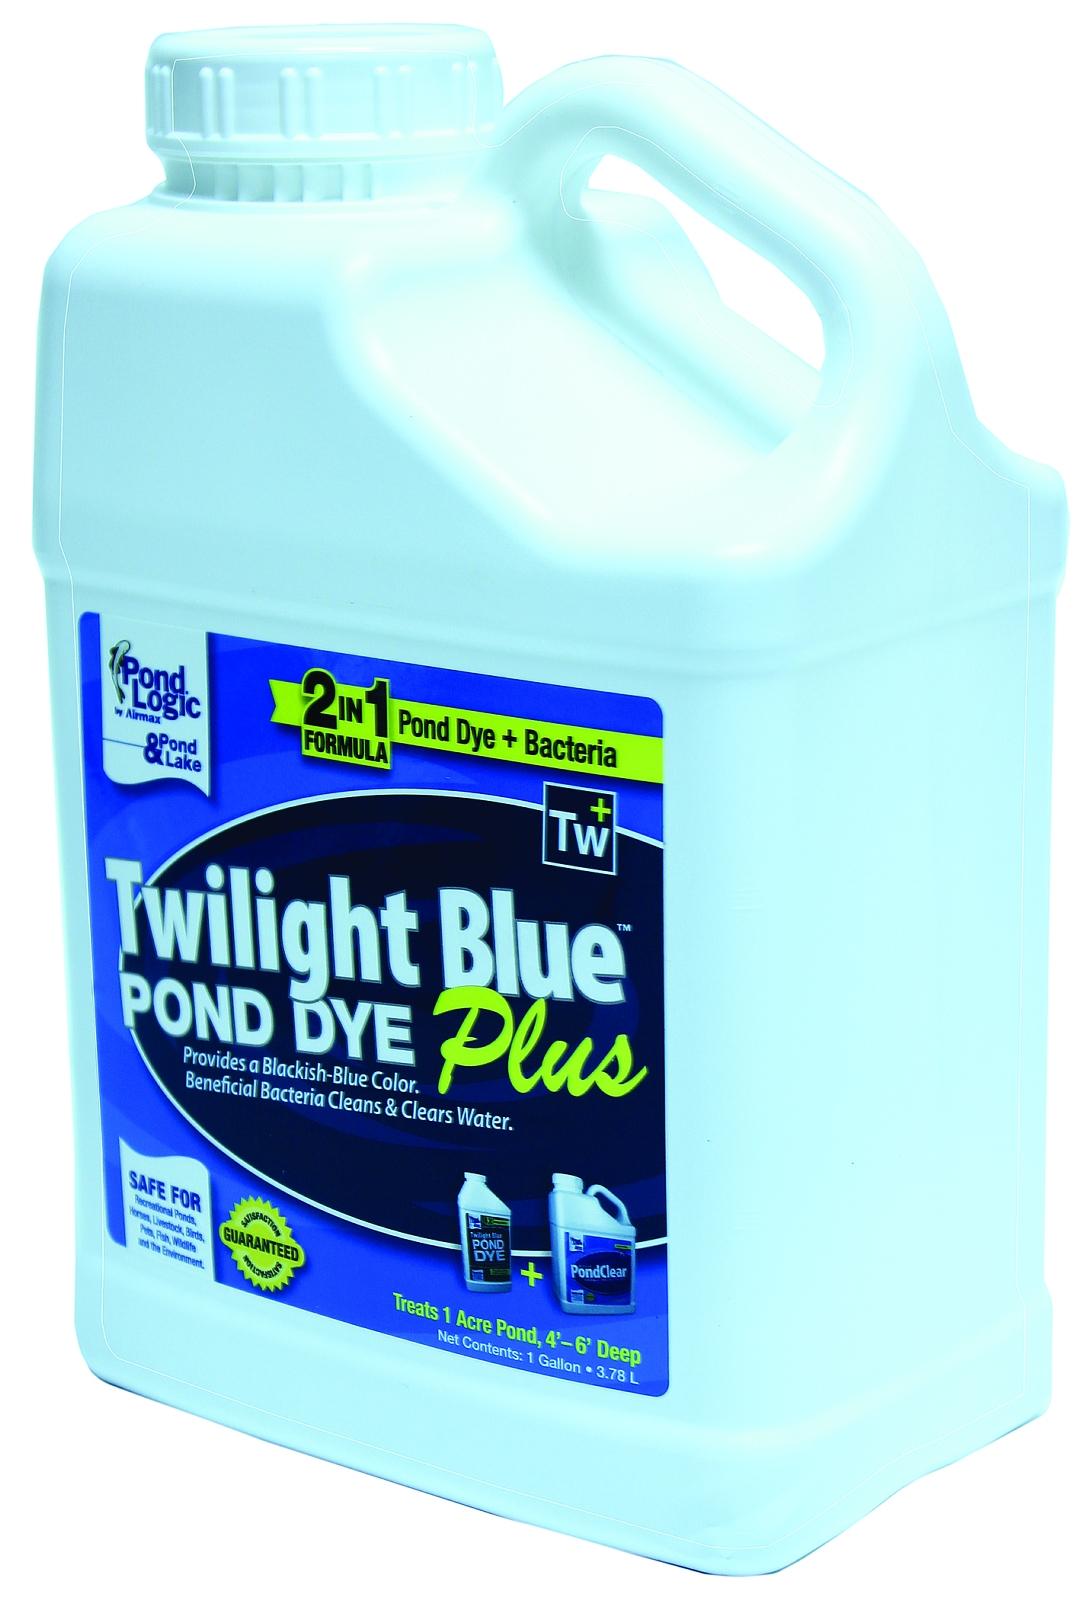 Twilight Blue Pond Dye Plus